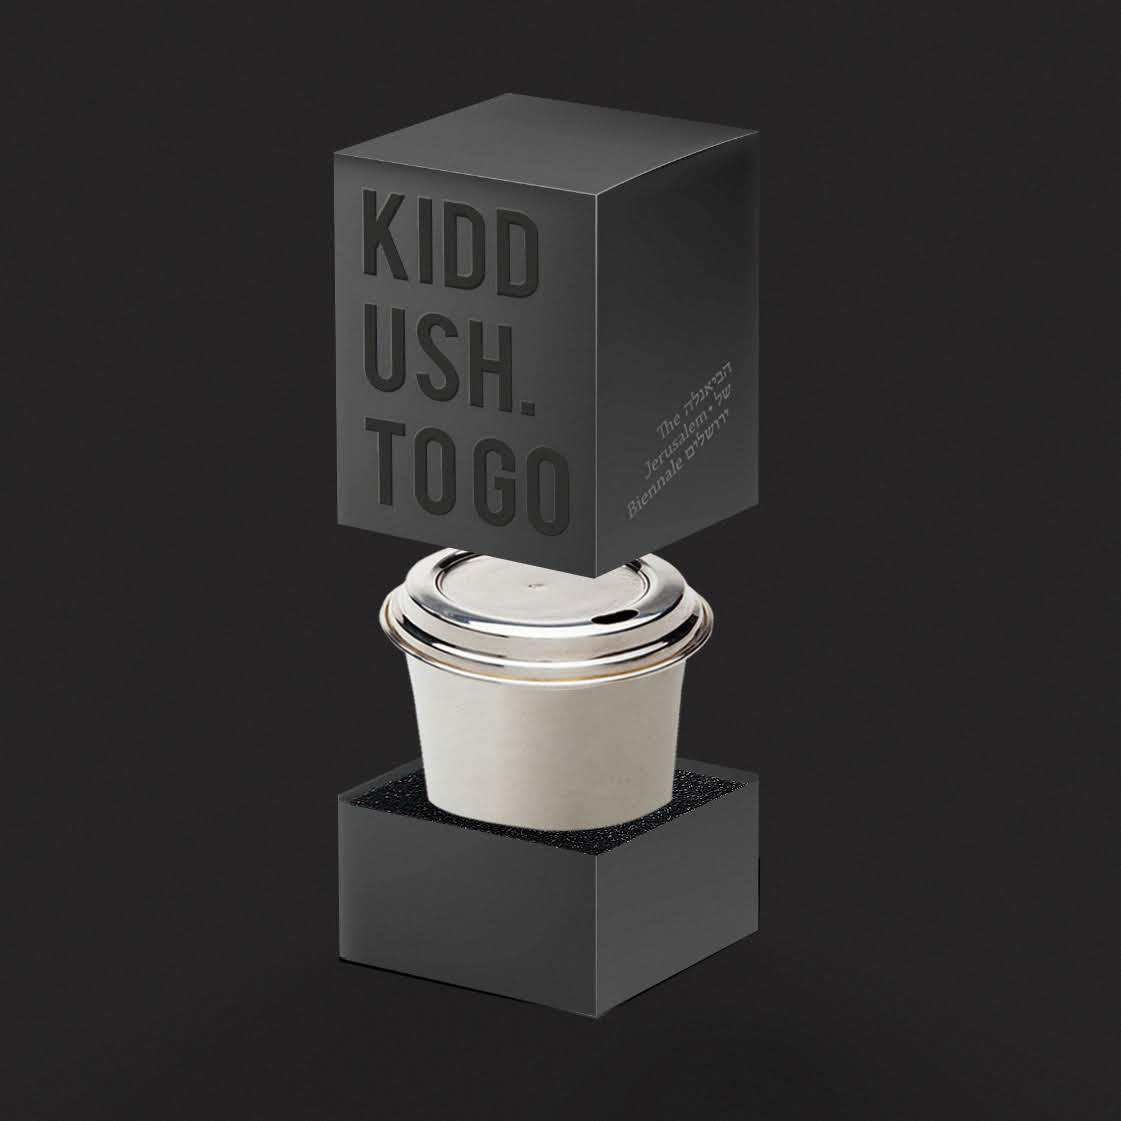 Kiddush To Go 2018 | Arik Weiss | Luz Art Los Angeles, CA